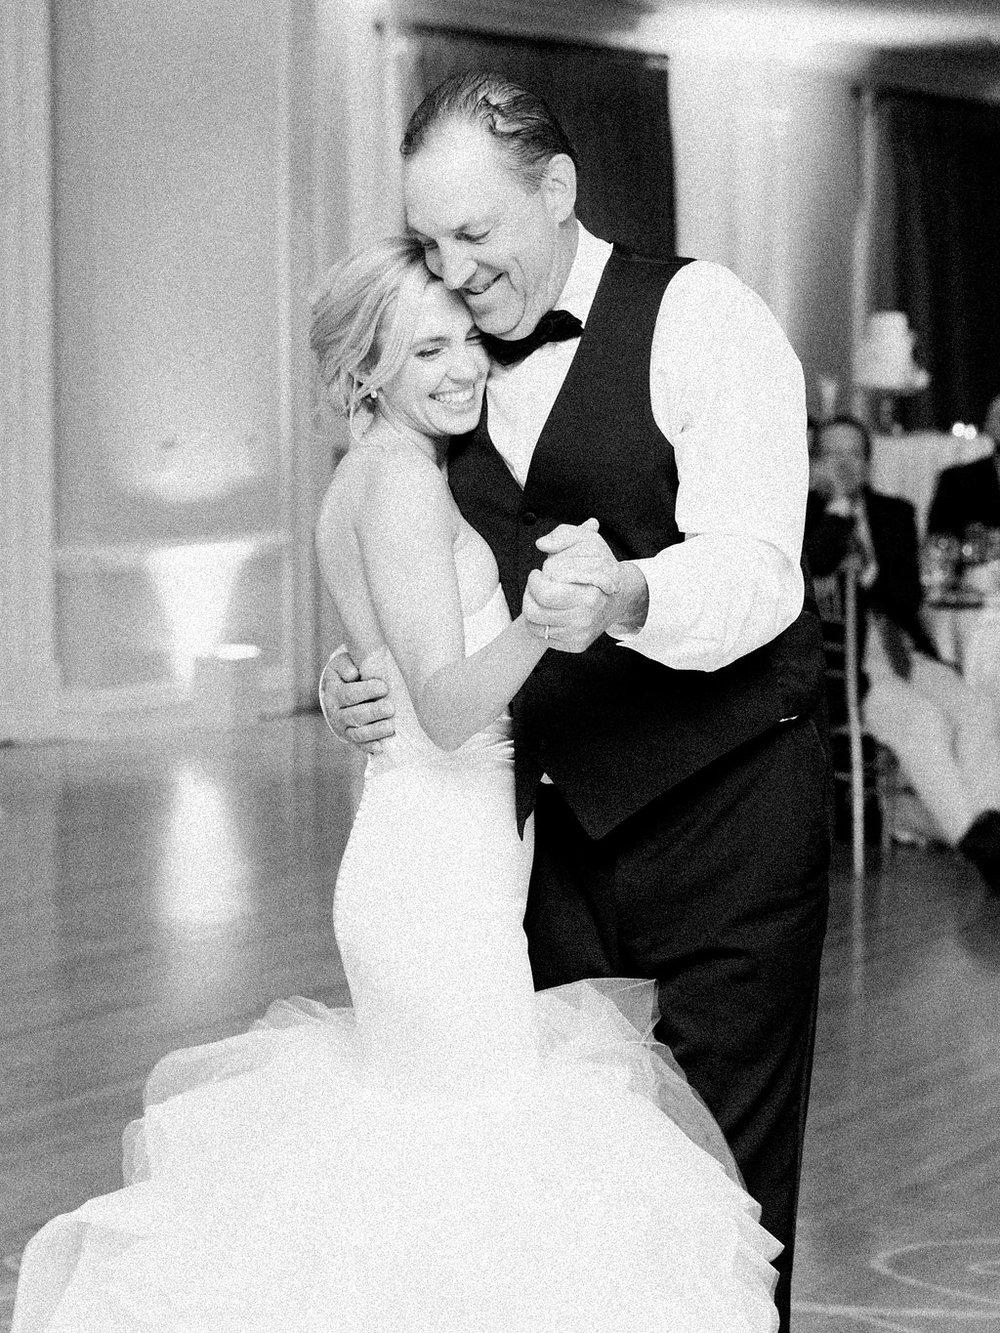 Diablo-County-Club-Wedding-Photography-San-Francisco-46.jpg